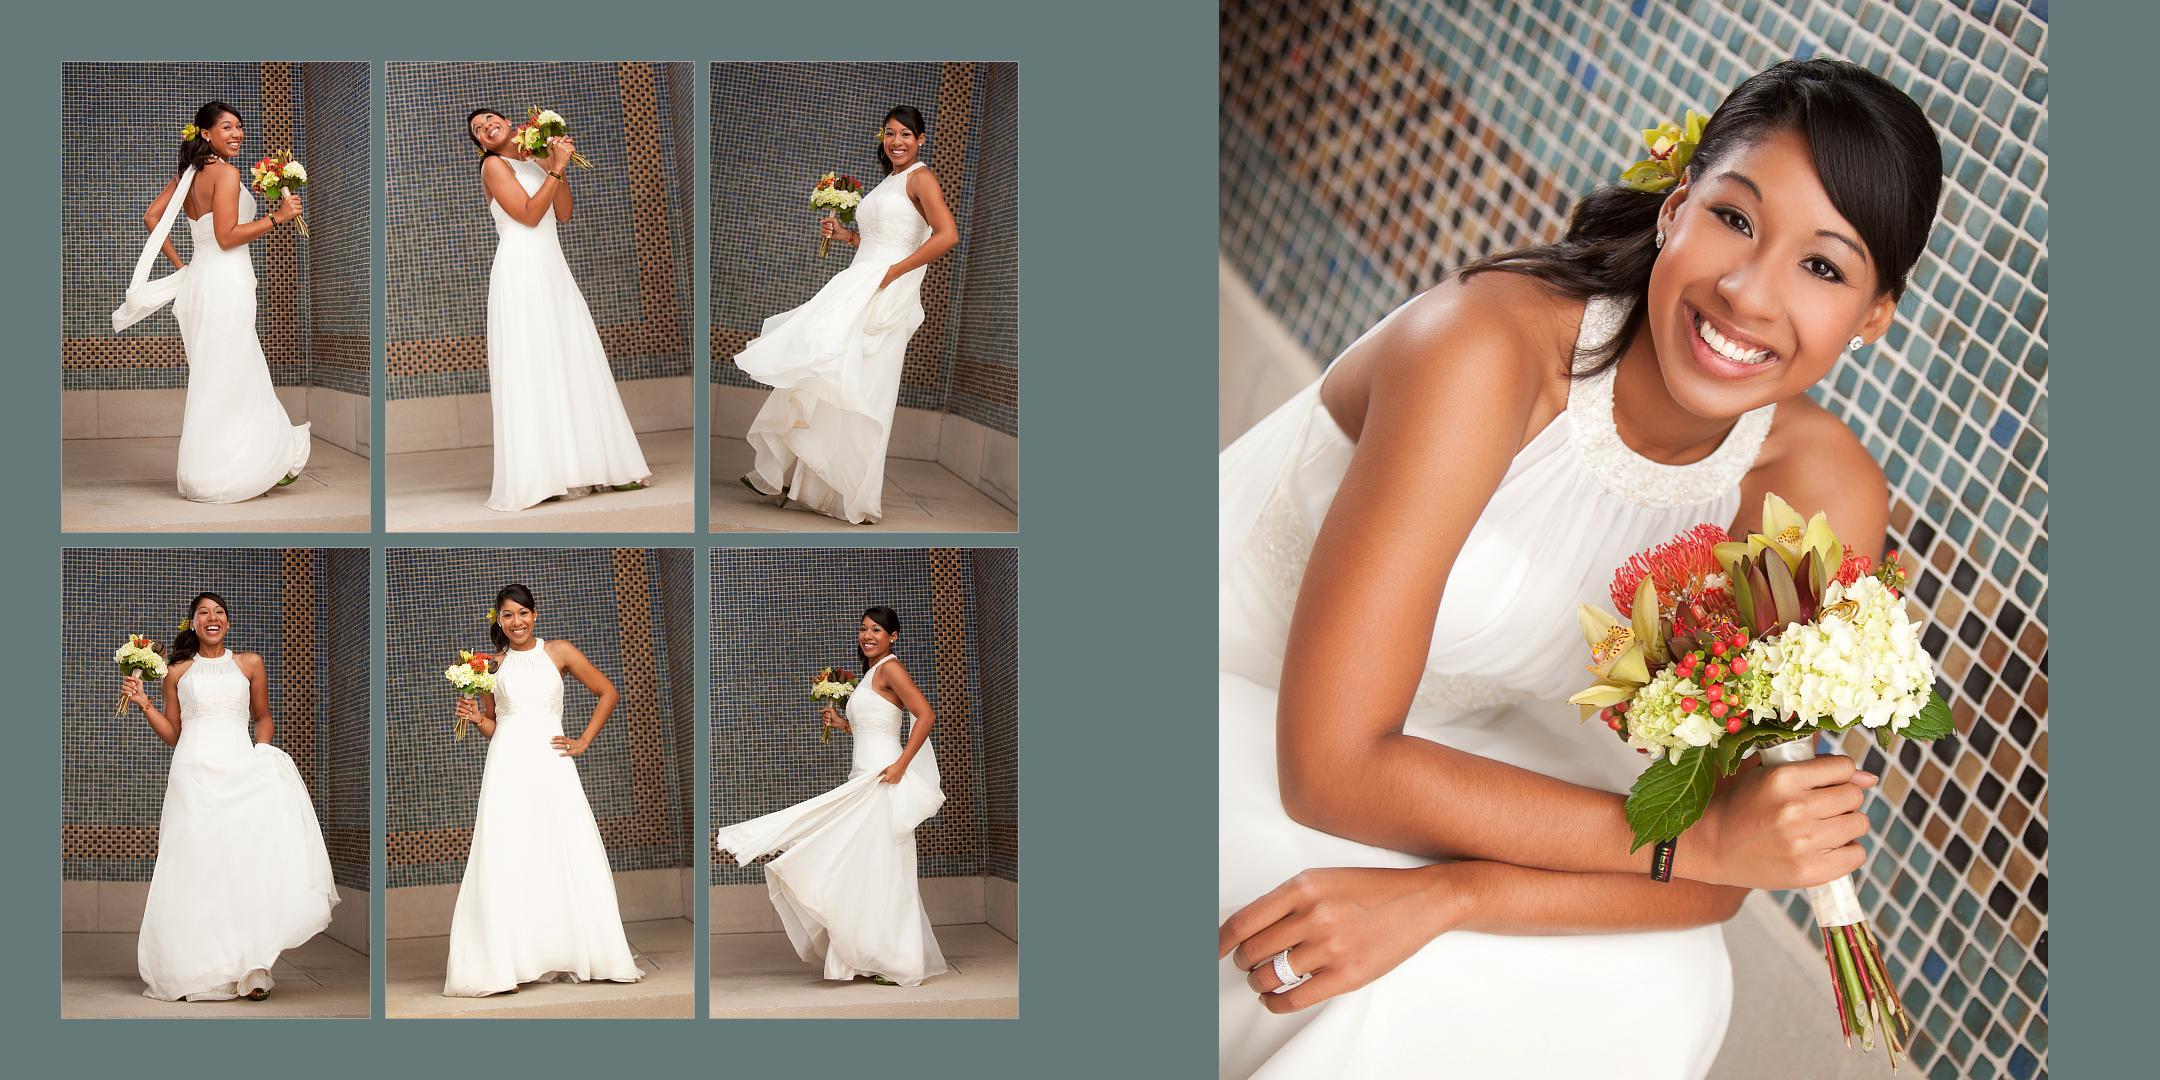 Wedding Photos by Tom Schmidt Chicago (34)